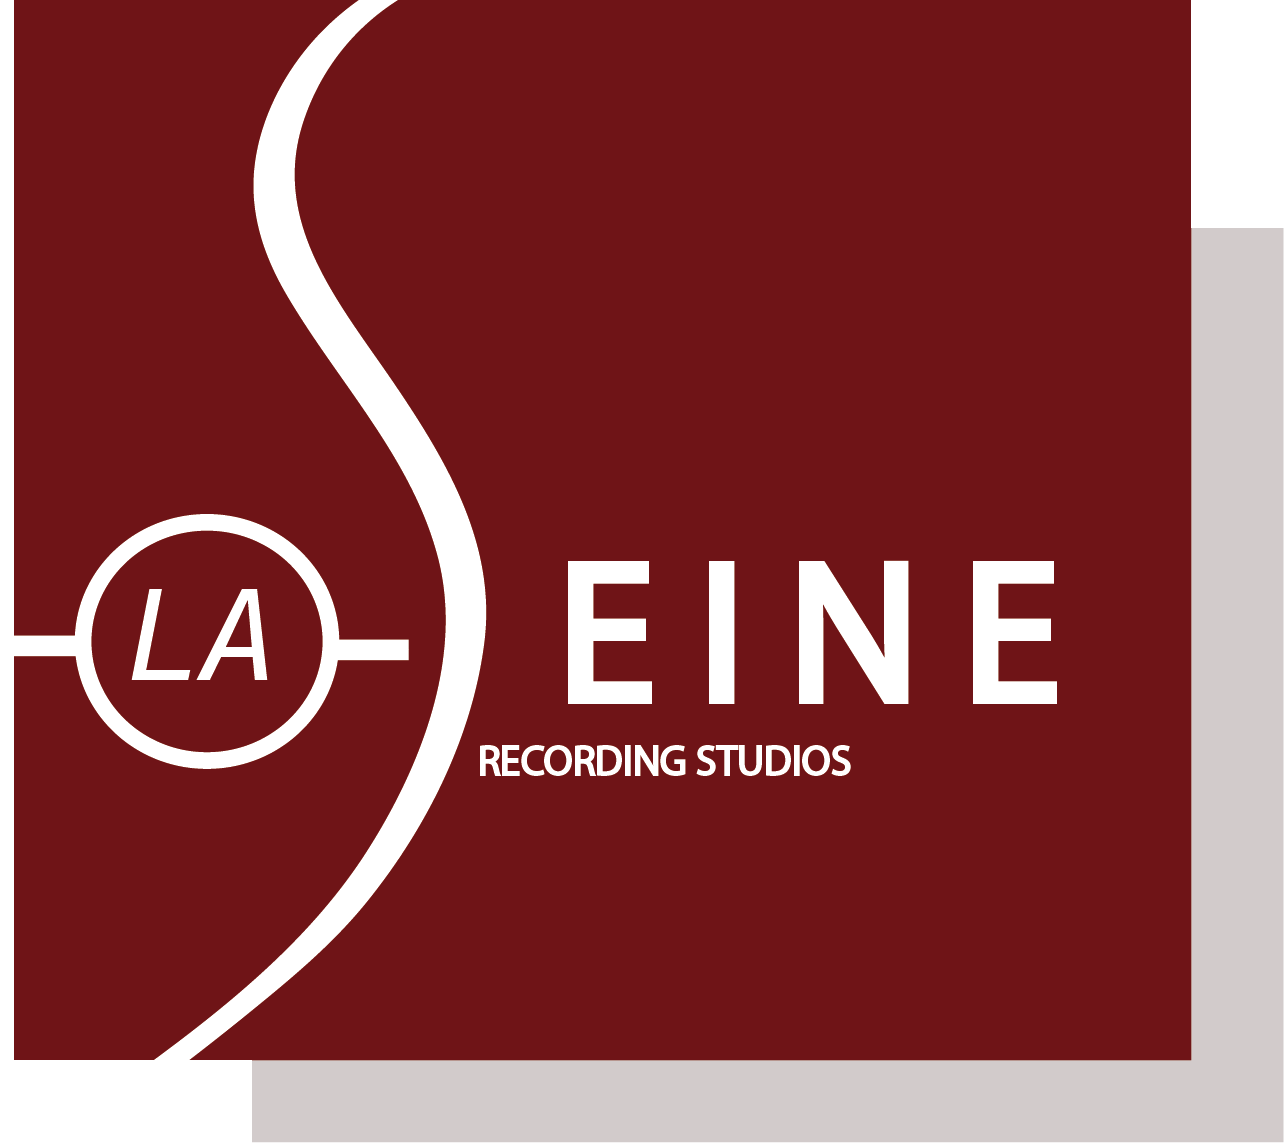 Les Studios de la Seine